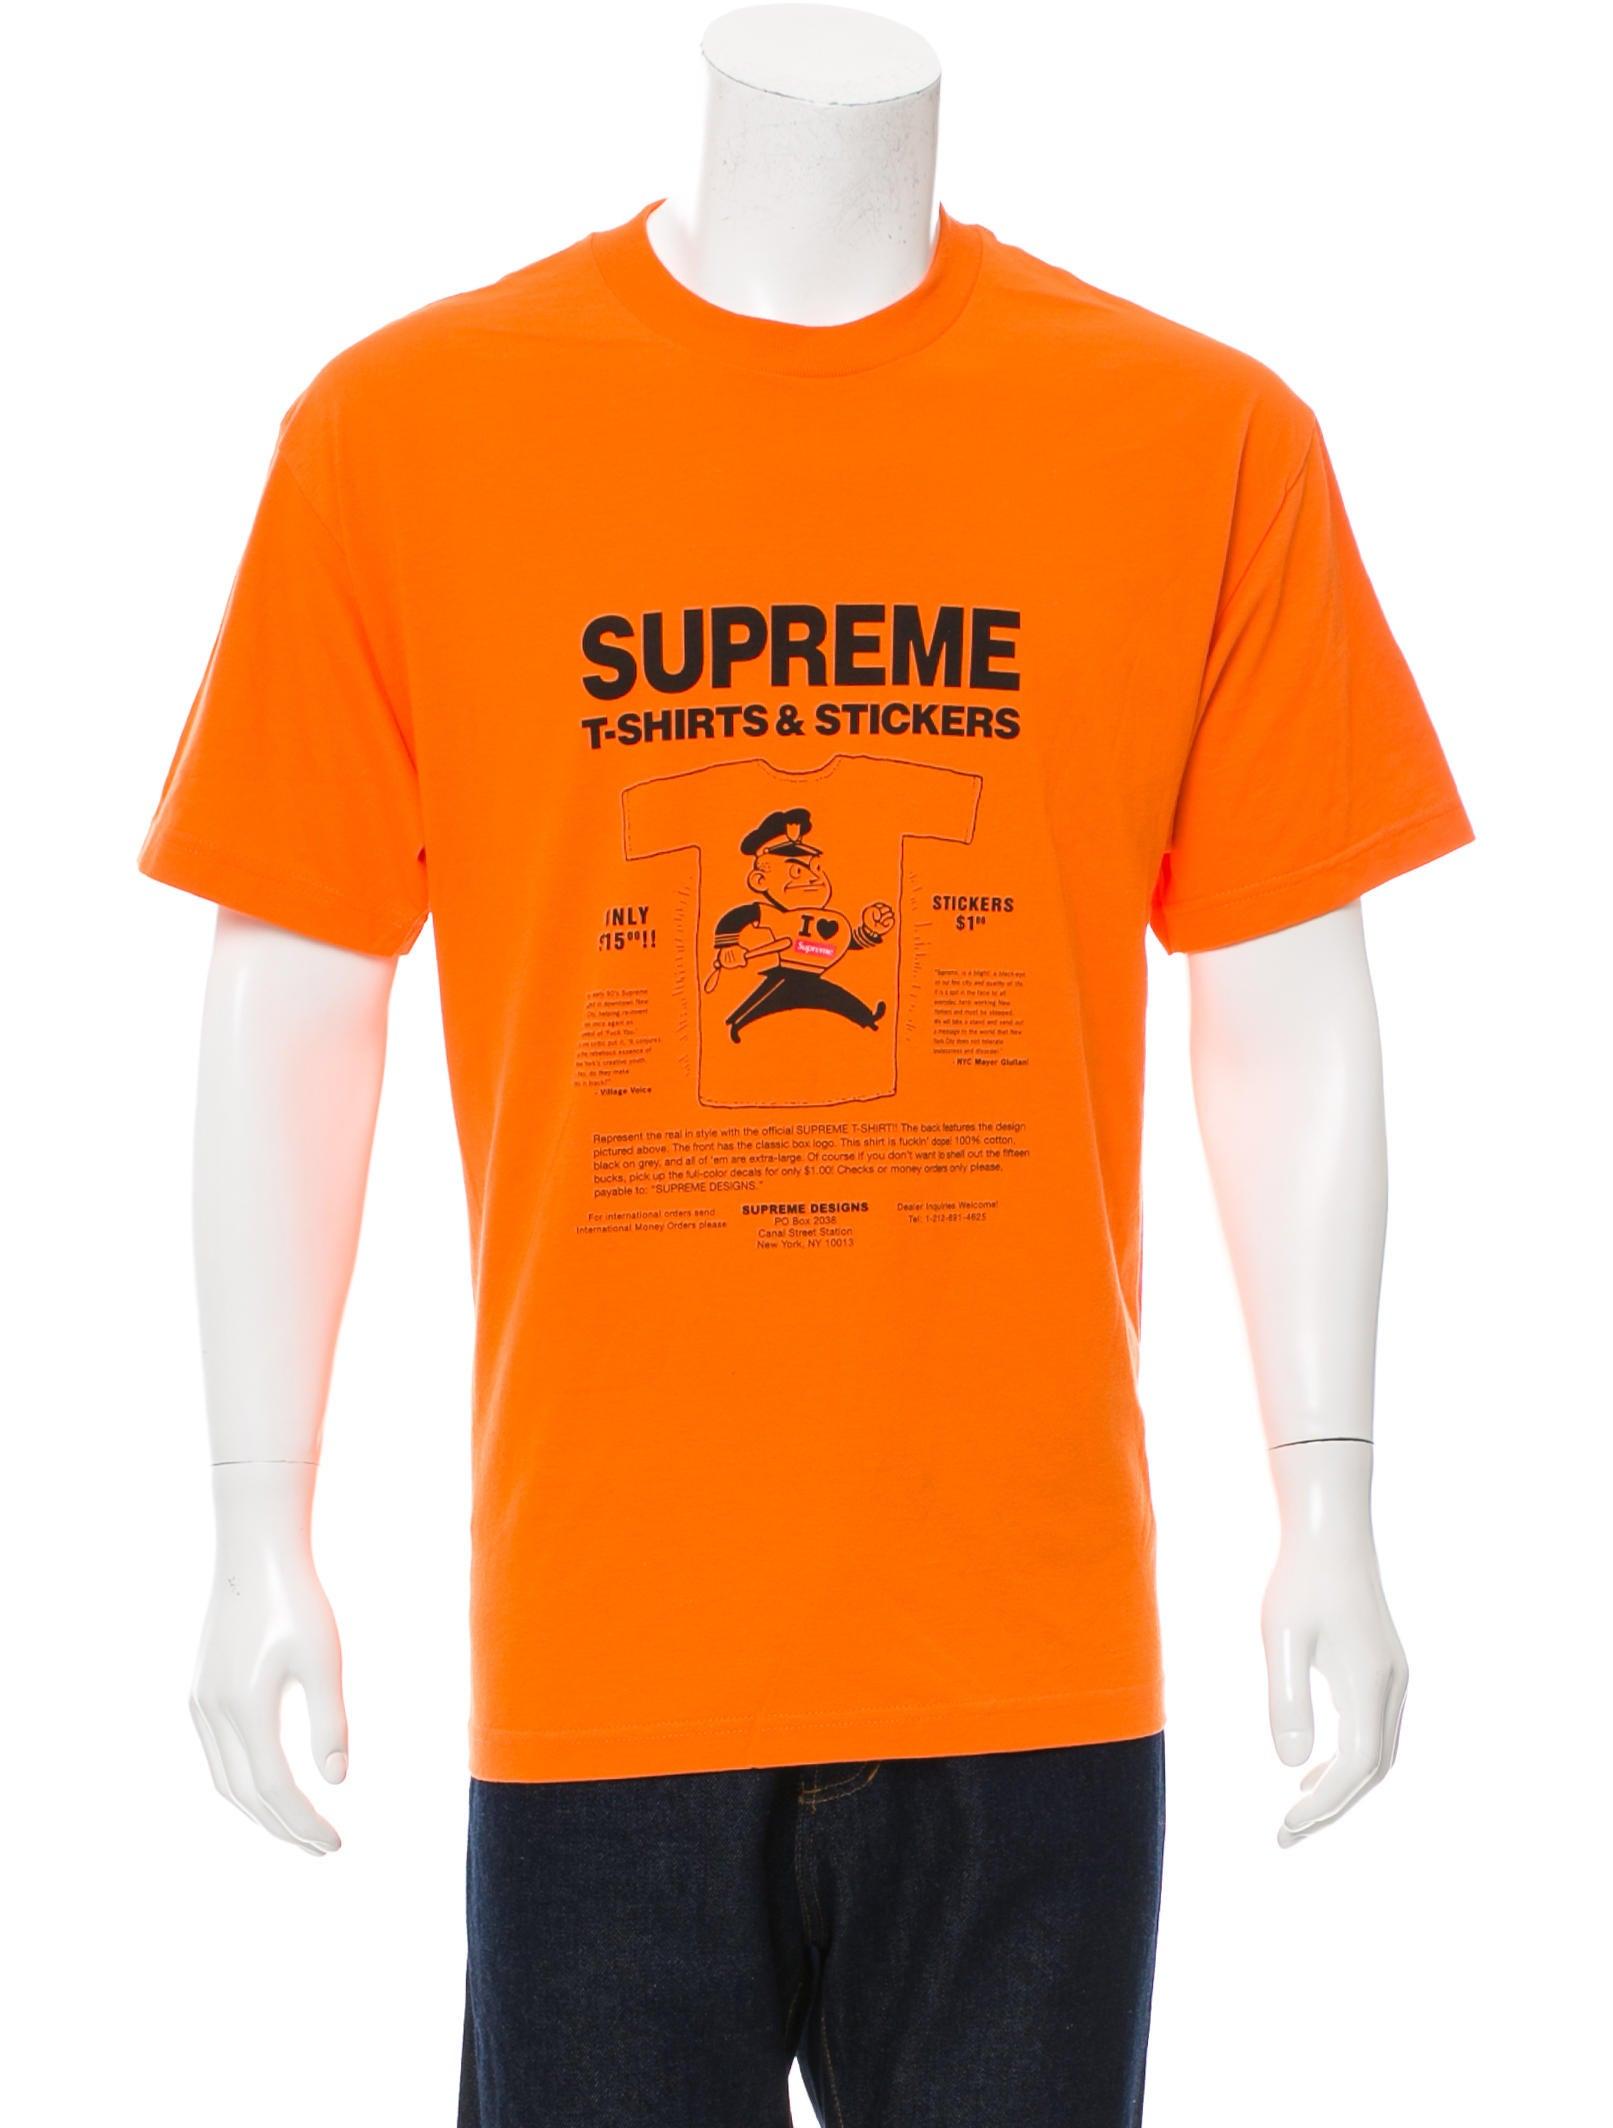 supreme t shirt stickers logo t shirt clothing. Black Bedroom Furniture Sets. Home Design Ideas